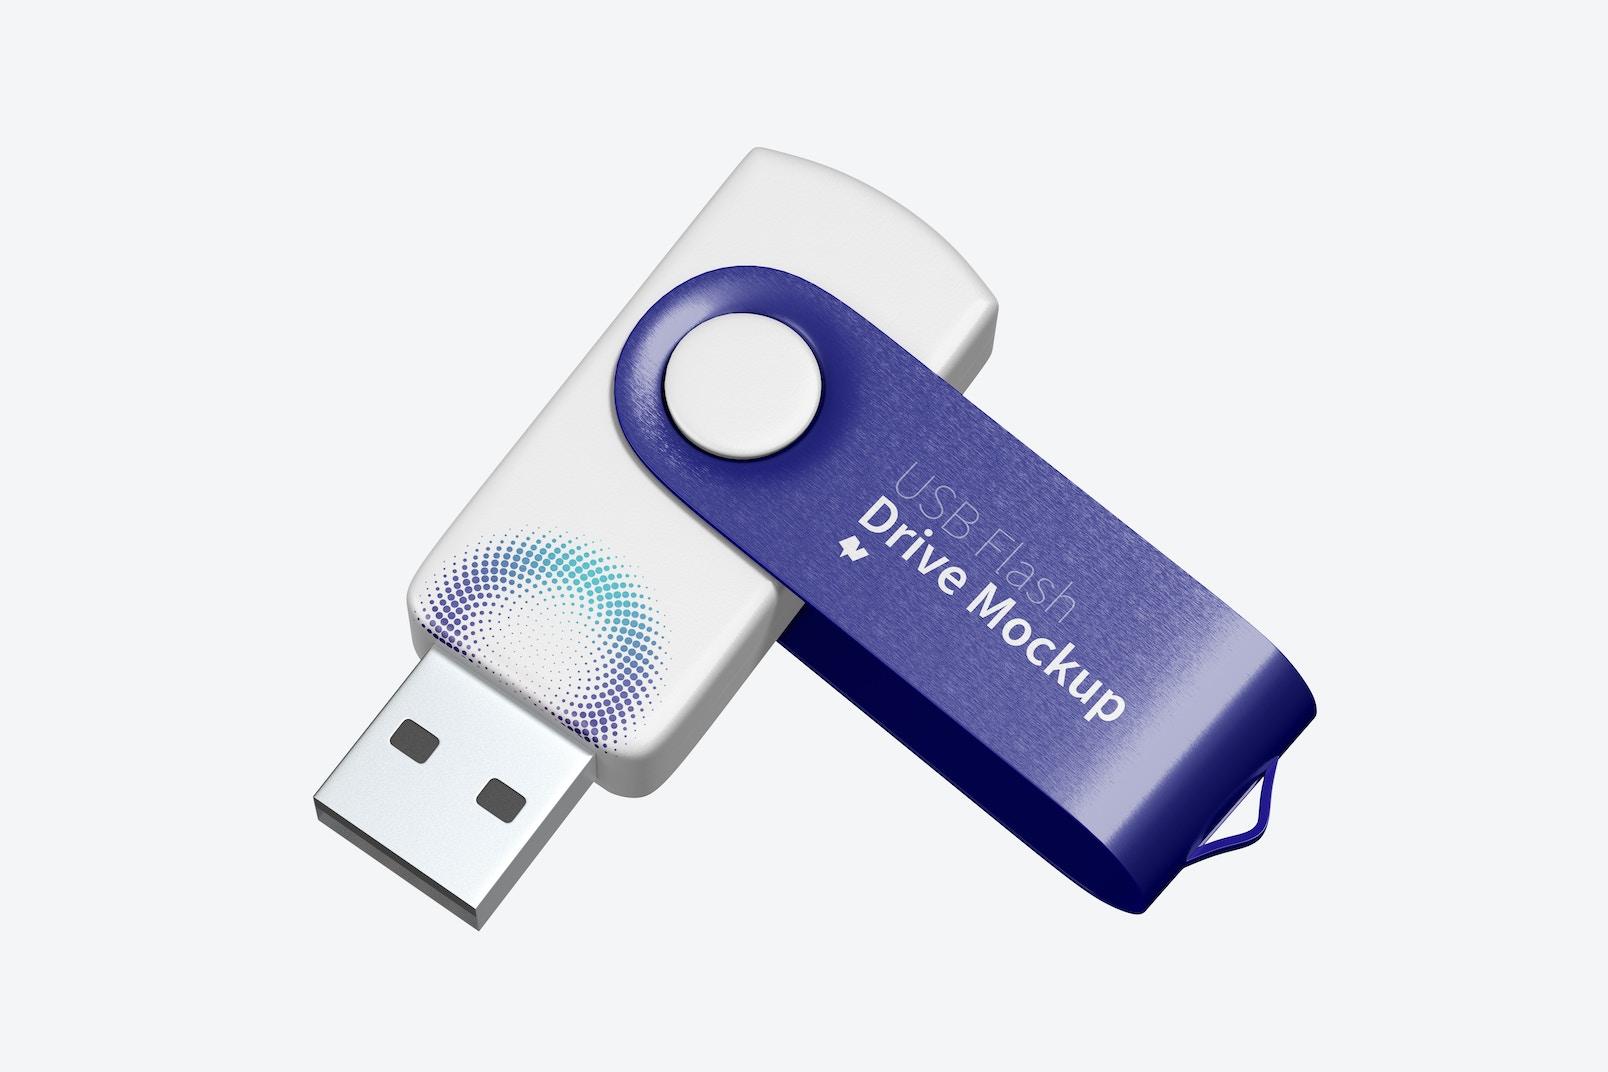 USB Flash Drive Opened Mockup, Falling